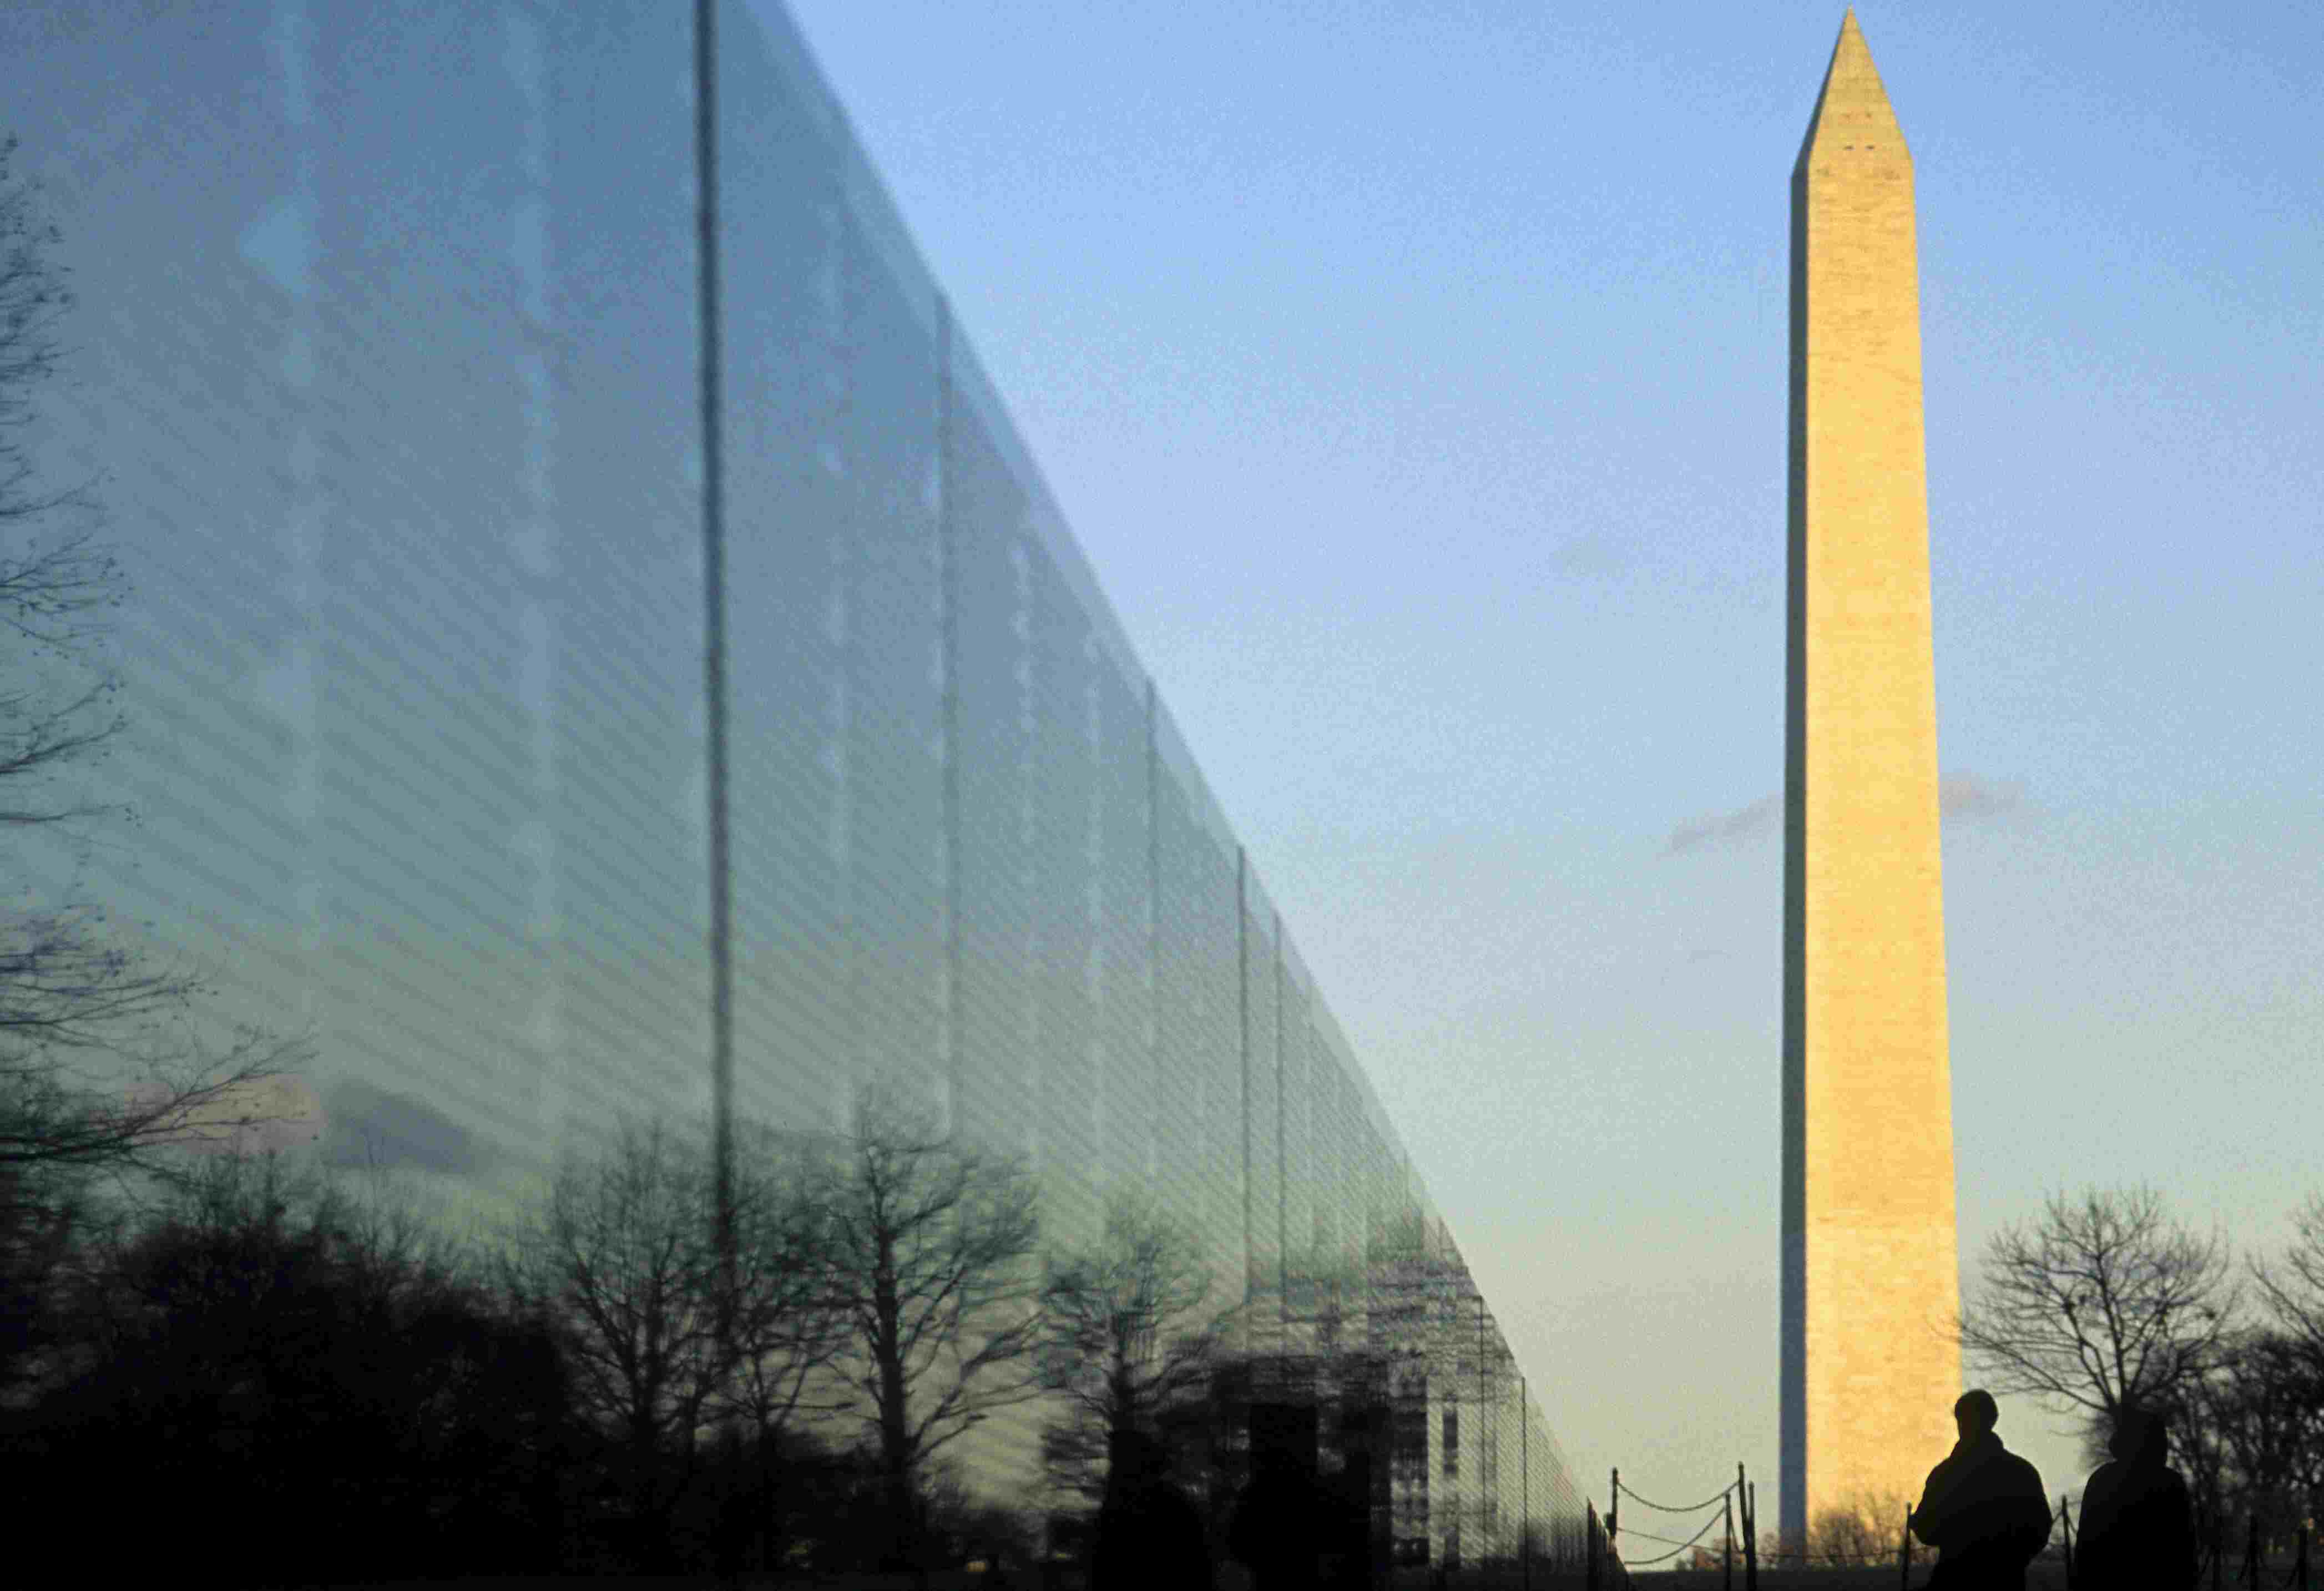 Vietnam Veterans Memorial and Washington Monument